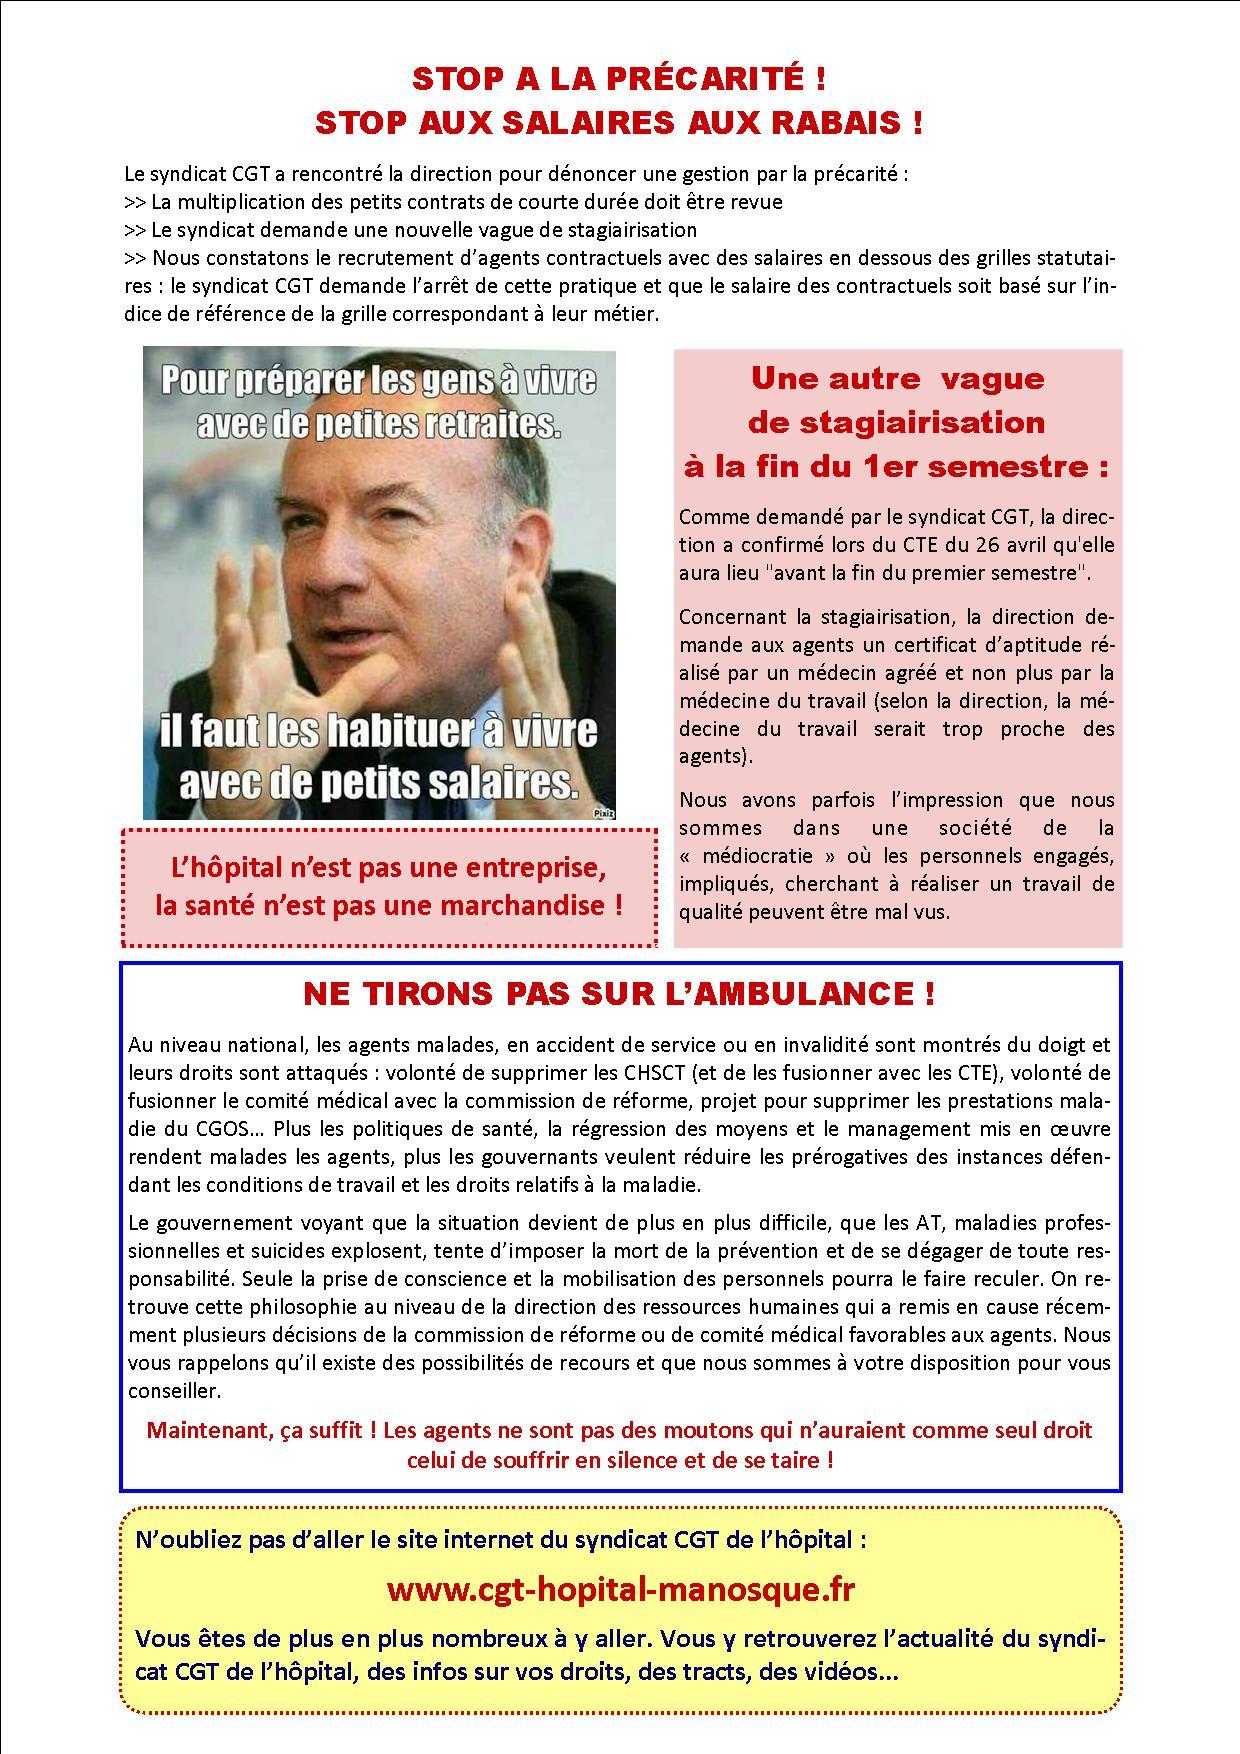 967. Info CGT Hôpital de Manosque (3)